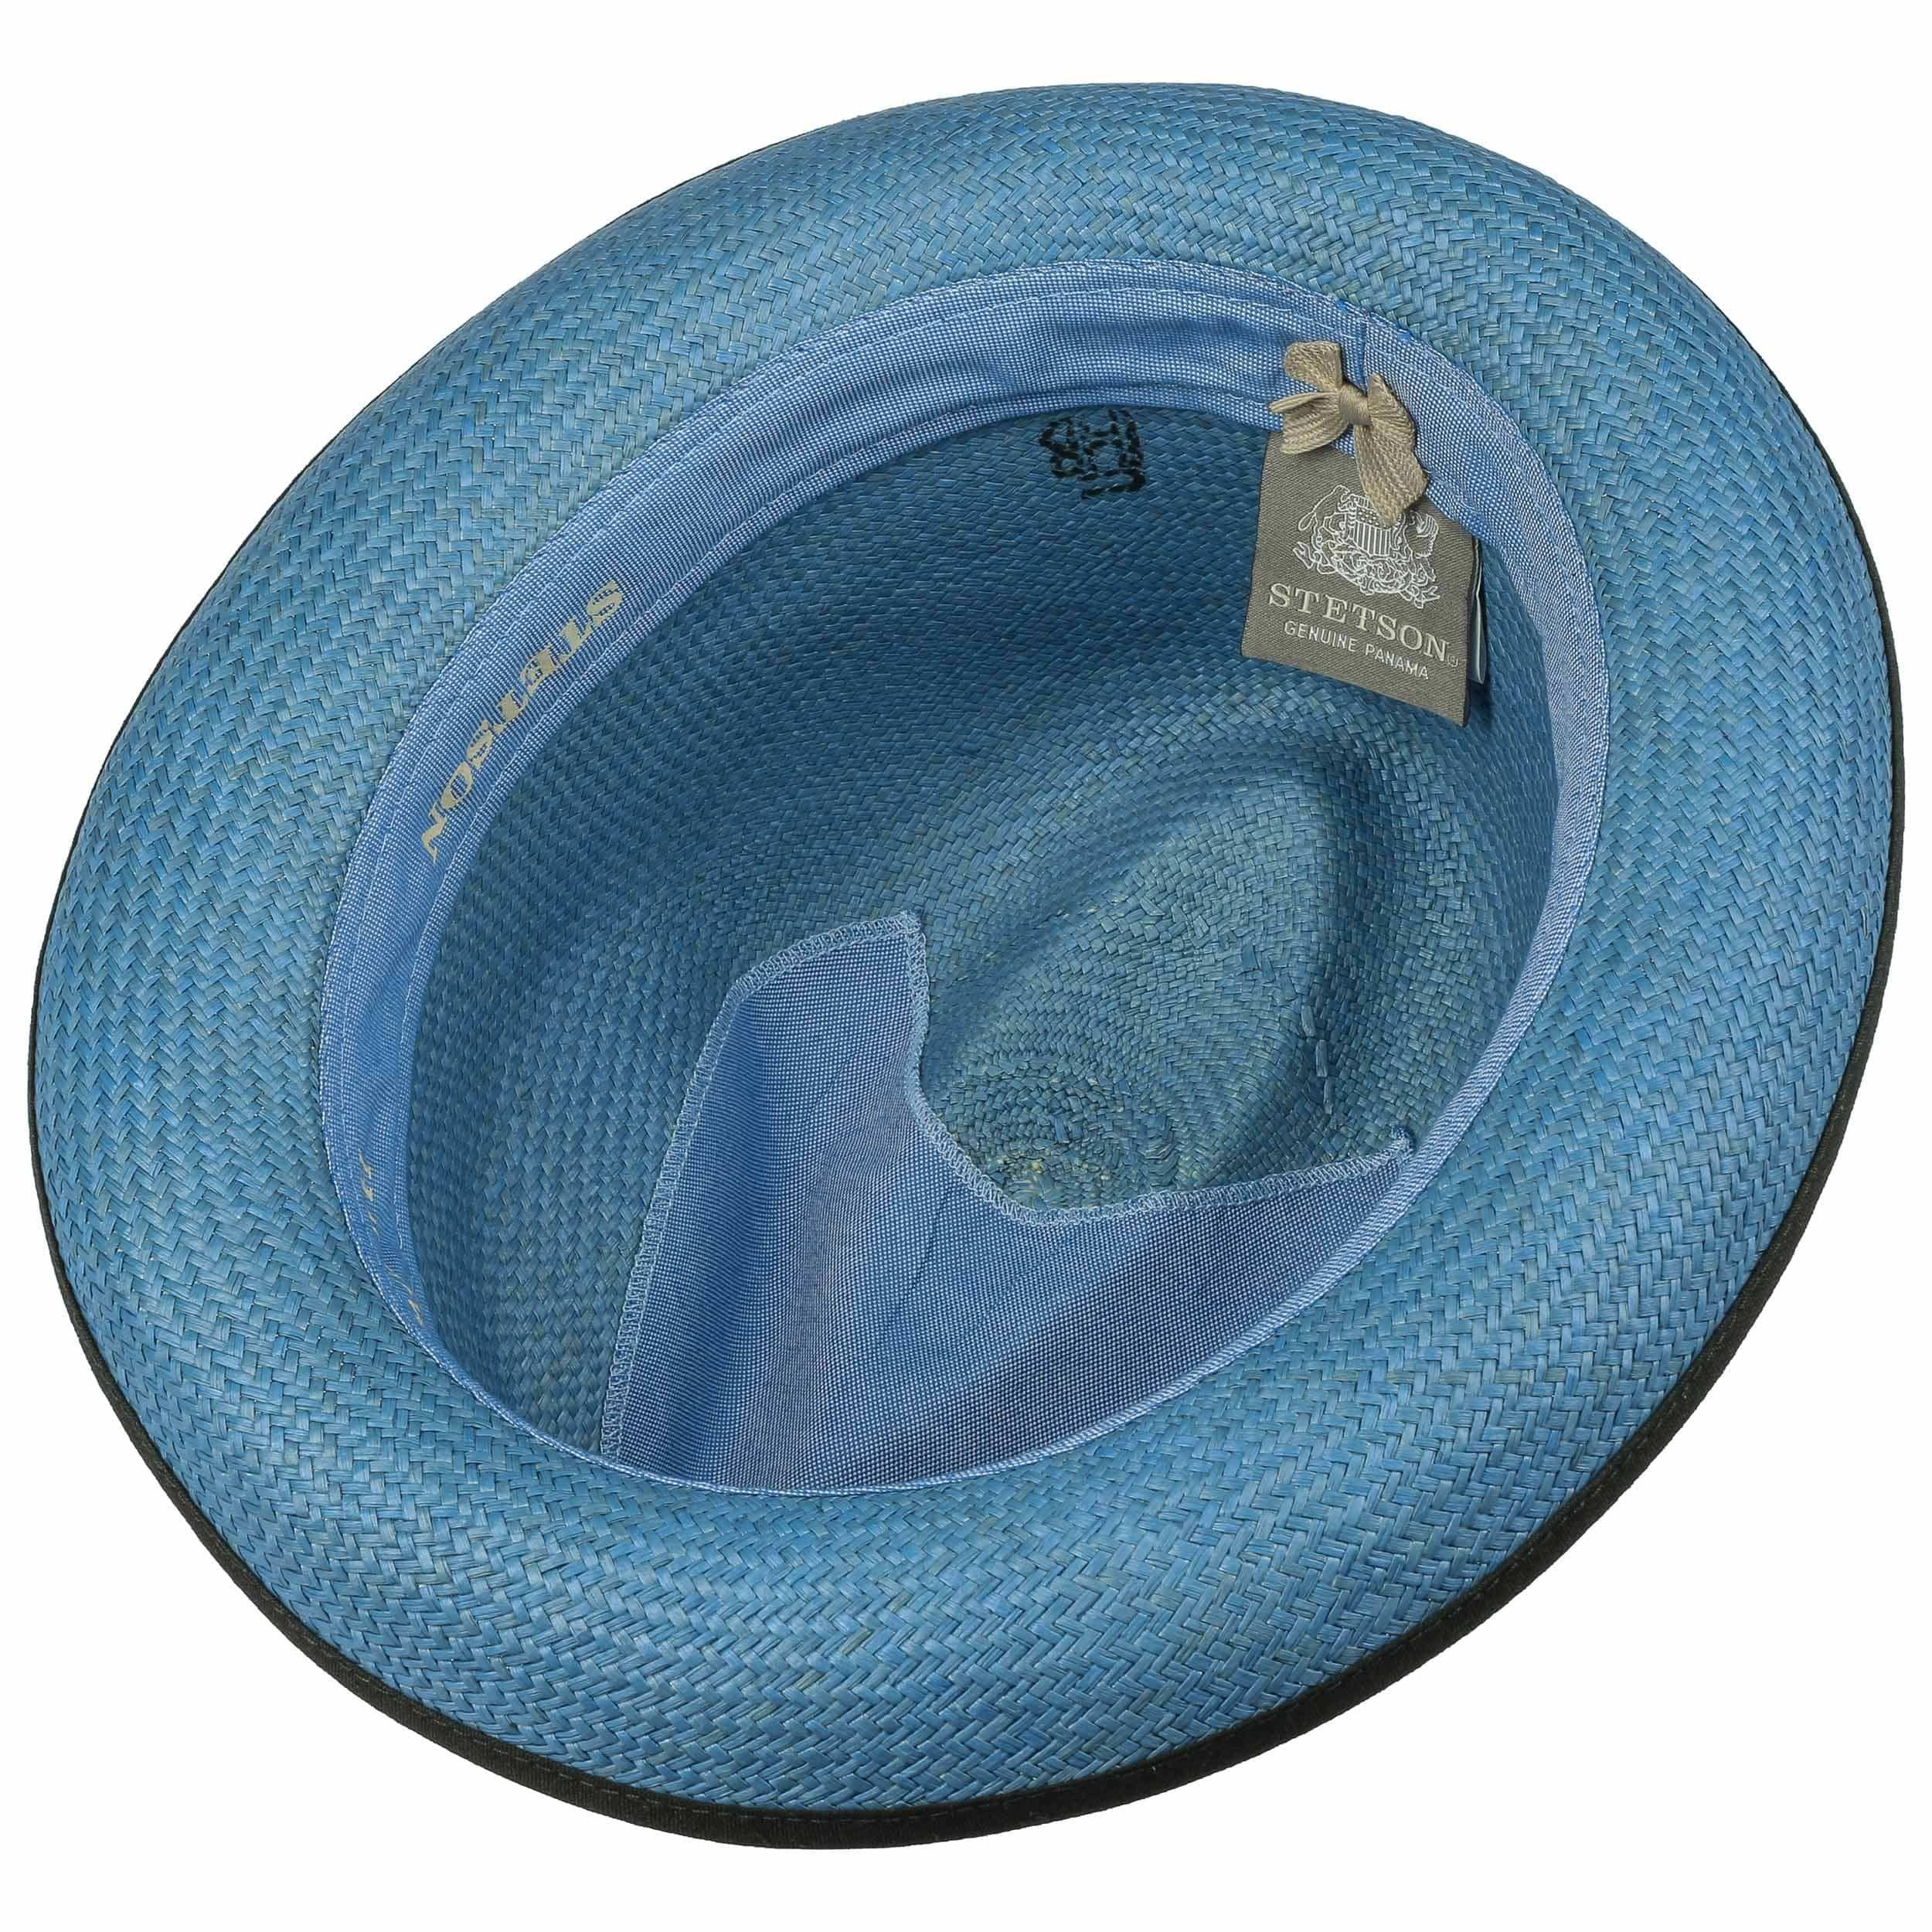 Neples Trilby Panamahoed blauw